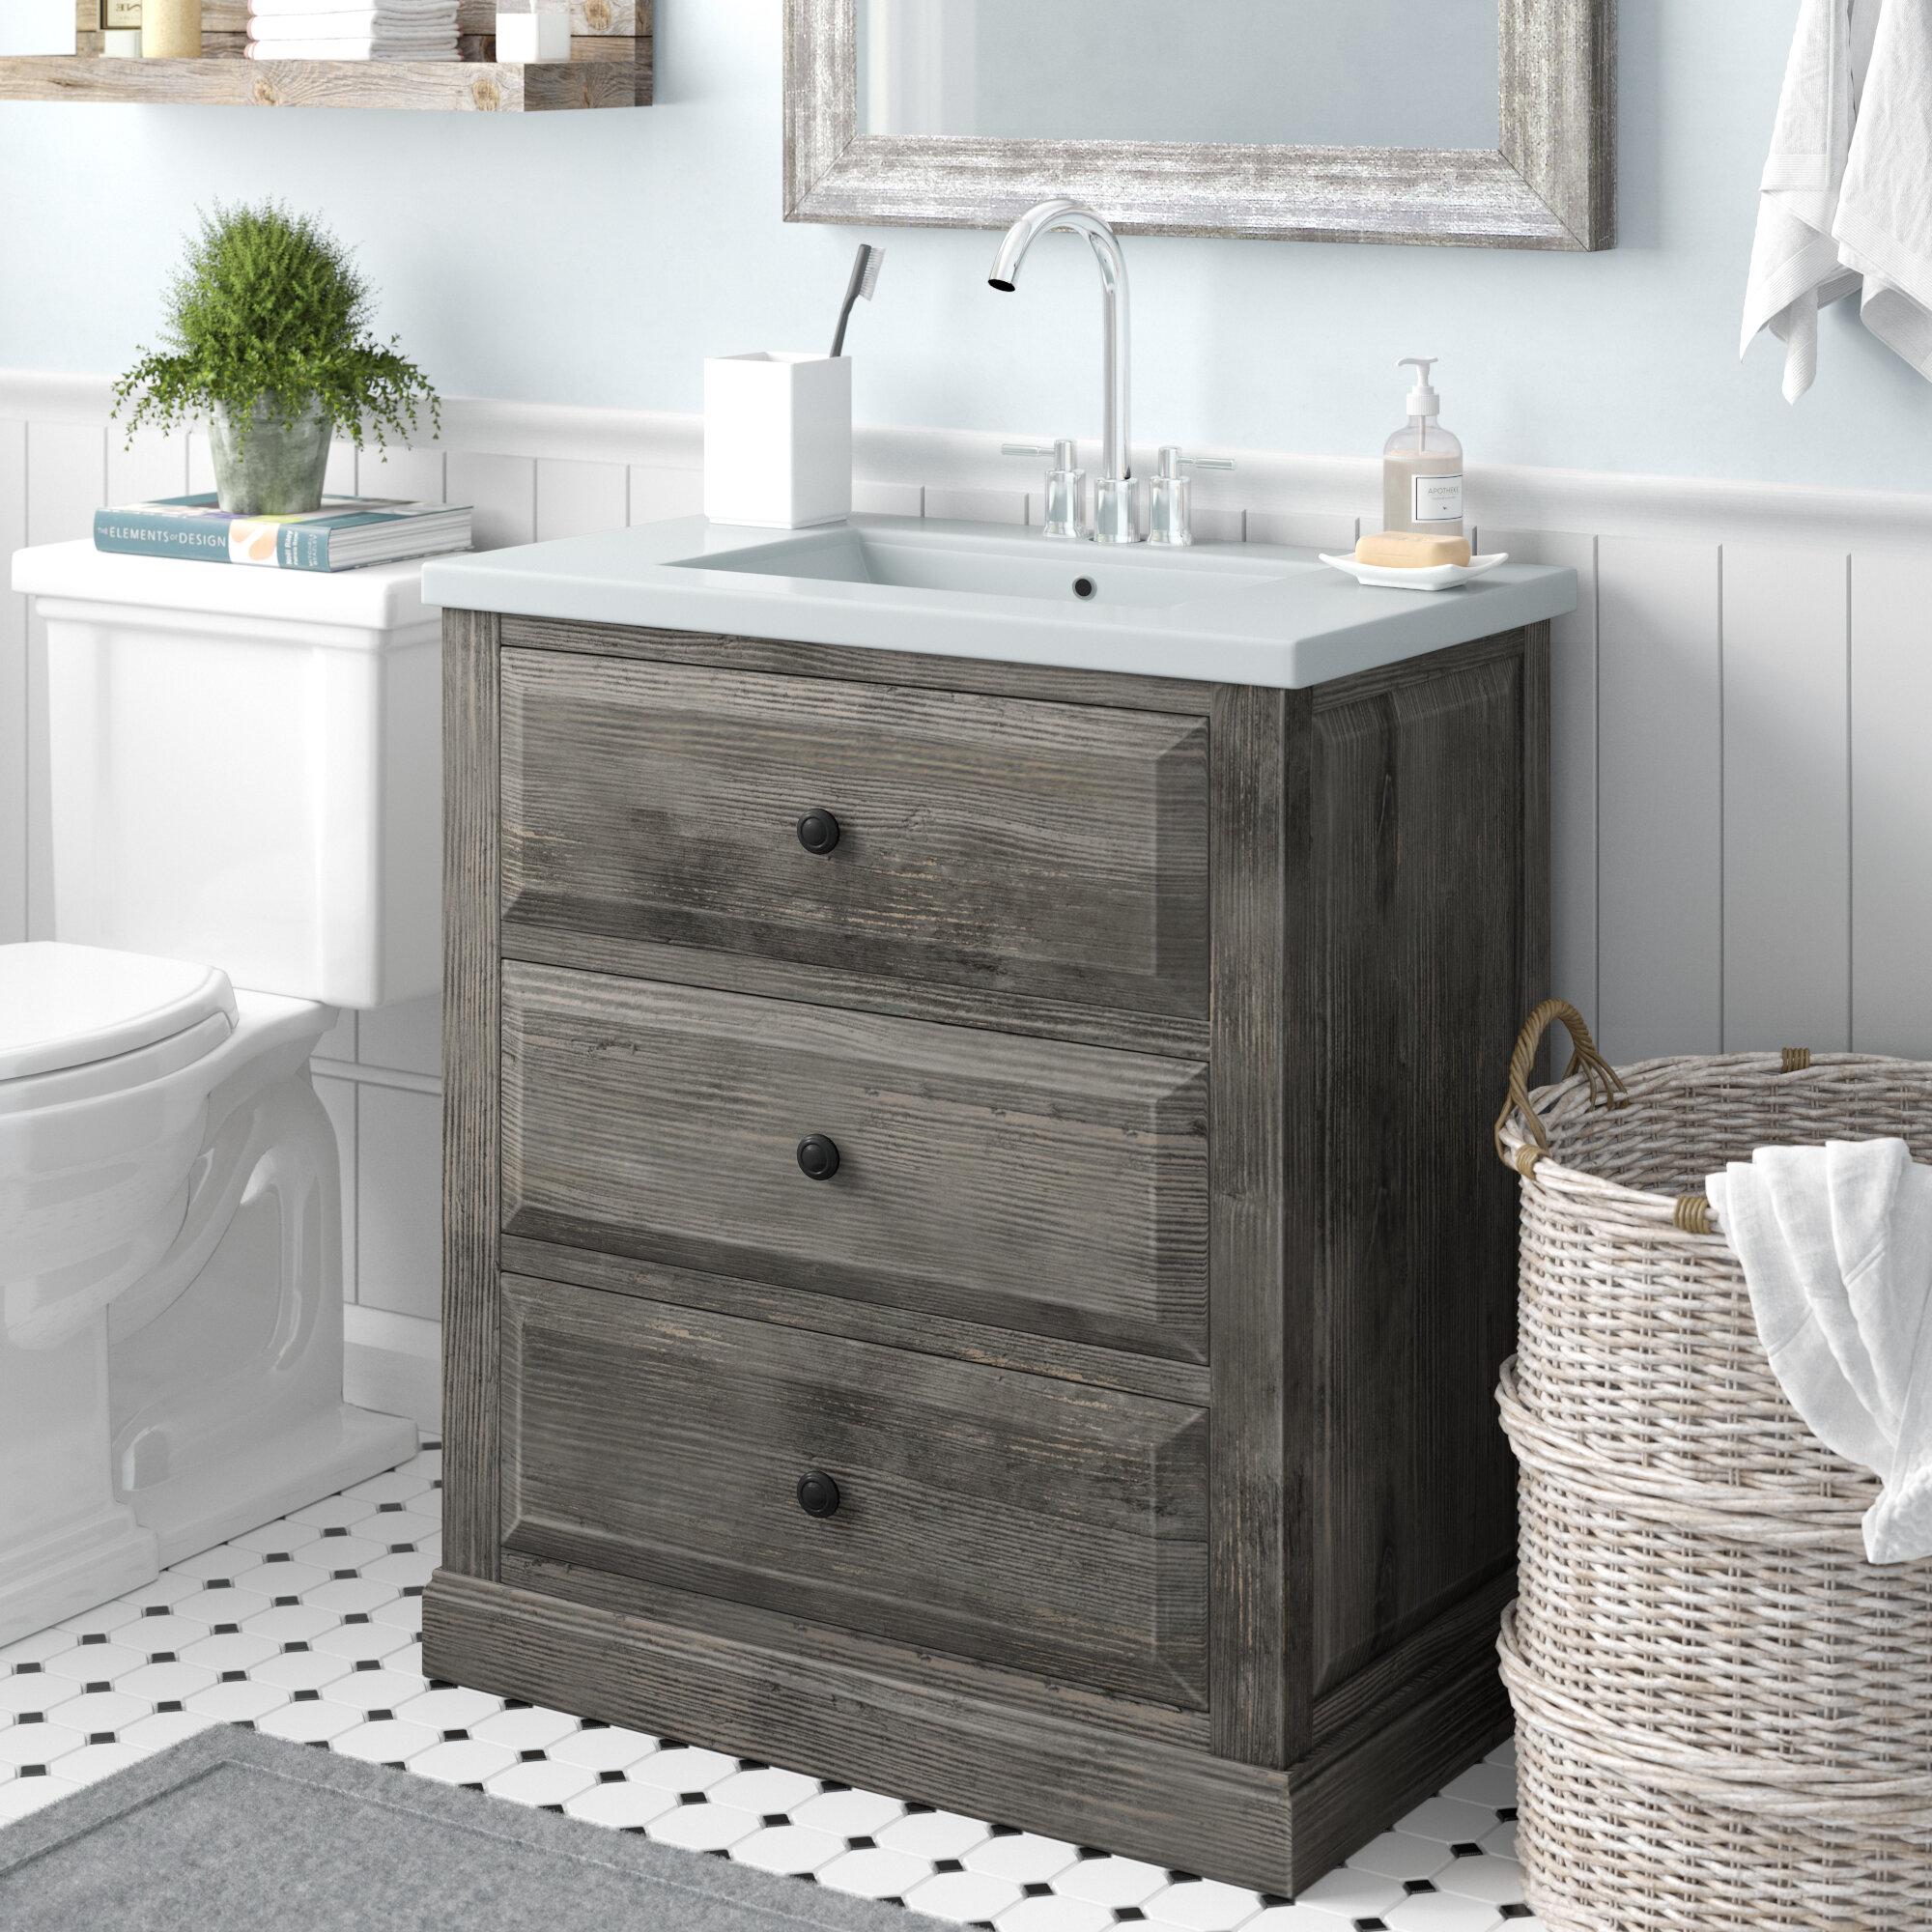 Gracie Oaks Aalisha 30 Single Sink Bathroom Vanity Set Reviews Wayfair